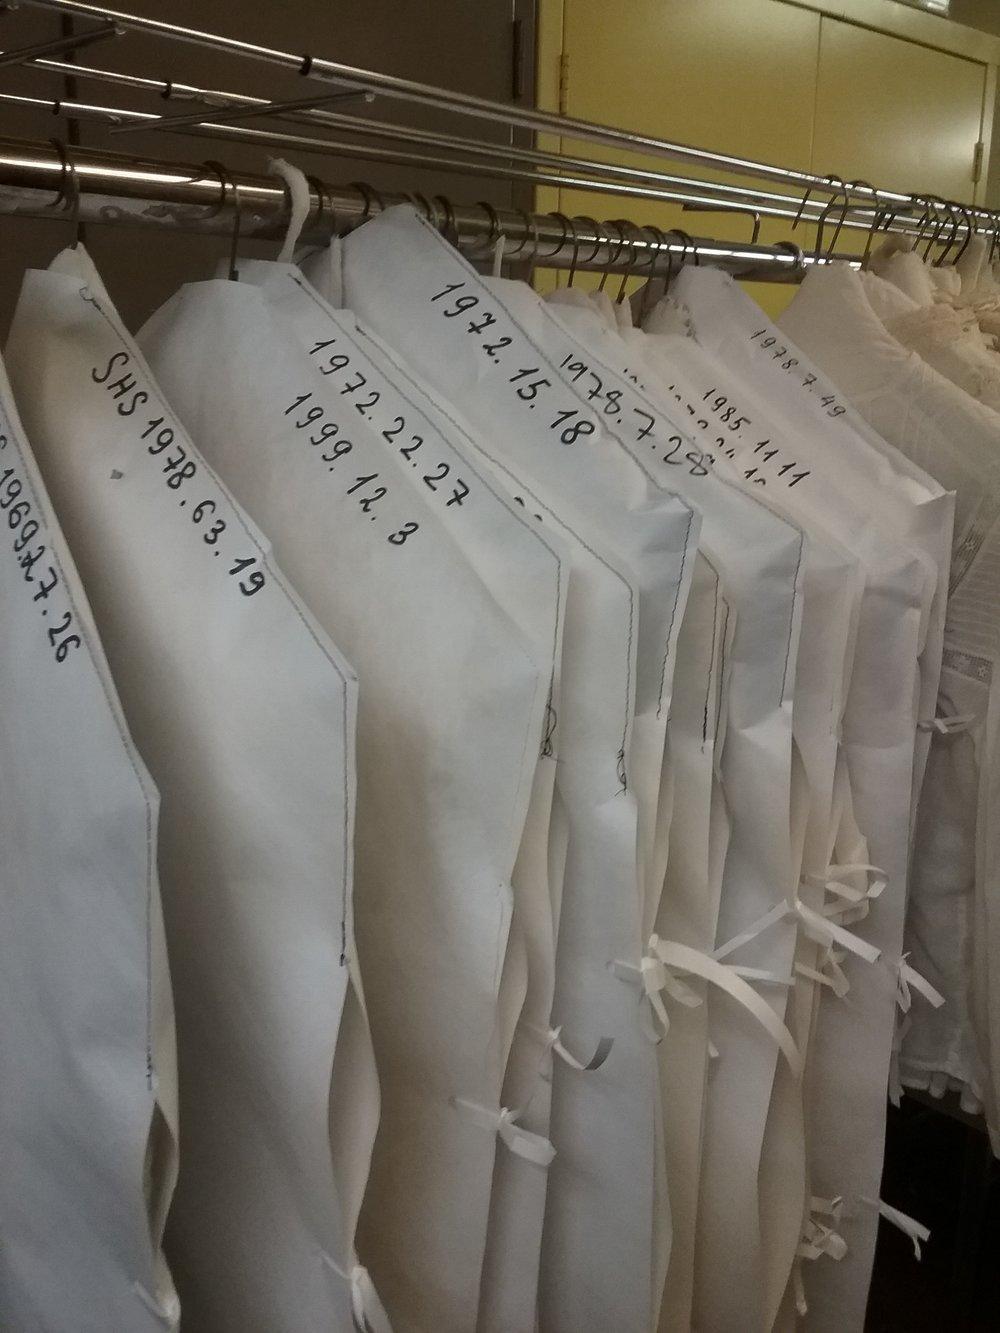 Garments inside Tyvek covers.jpg